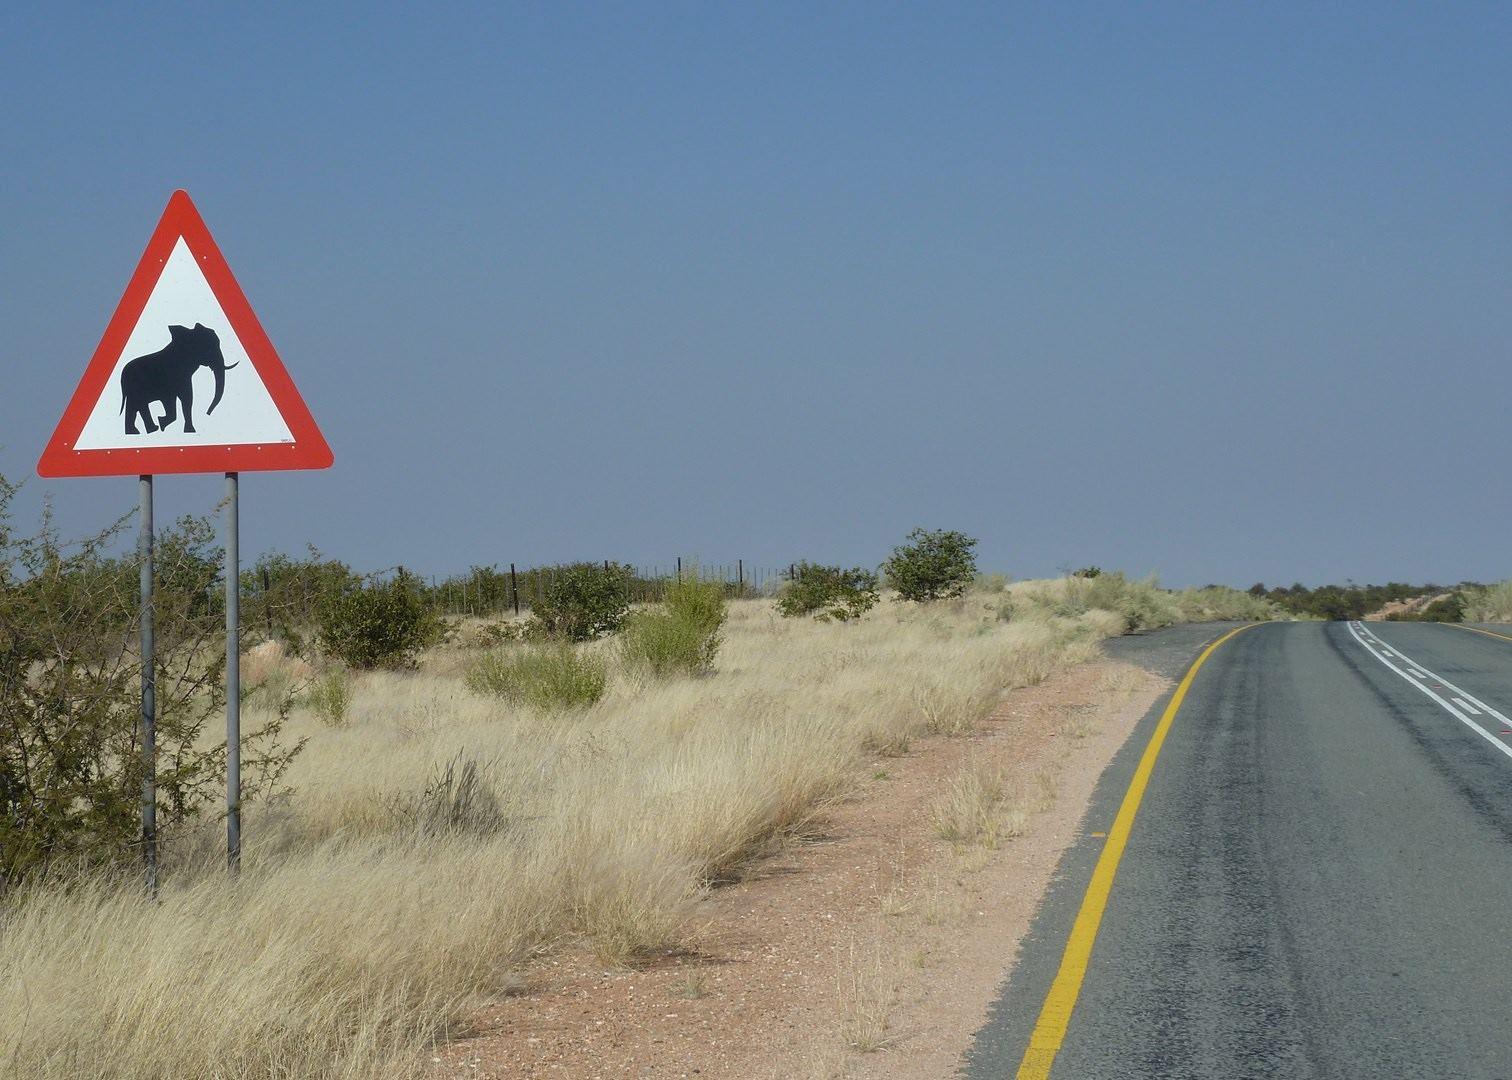 Classic Namibia self-drive safari | Audley Travel